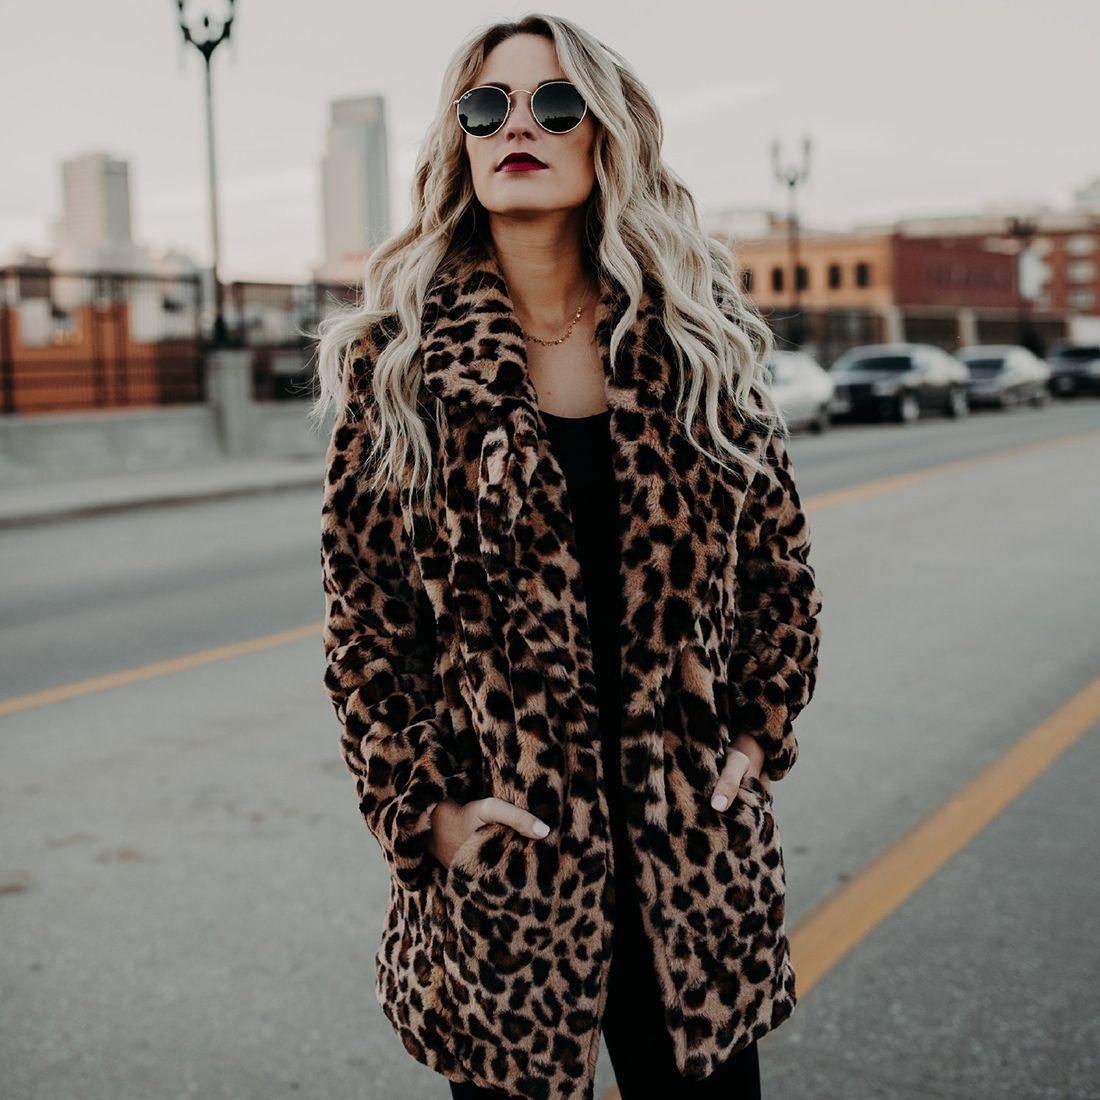 b85af8227d2f4 2019 Elegant Leopard Faux Fur Rabbit Fur Coat Women Autumn Plus Cashmere  Warm Coat Female Winter Cardigan Outwear Fake Fur Jacket D18110805 From  Shen8403